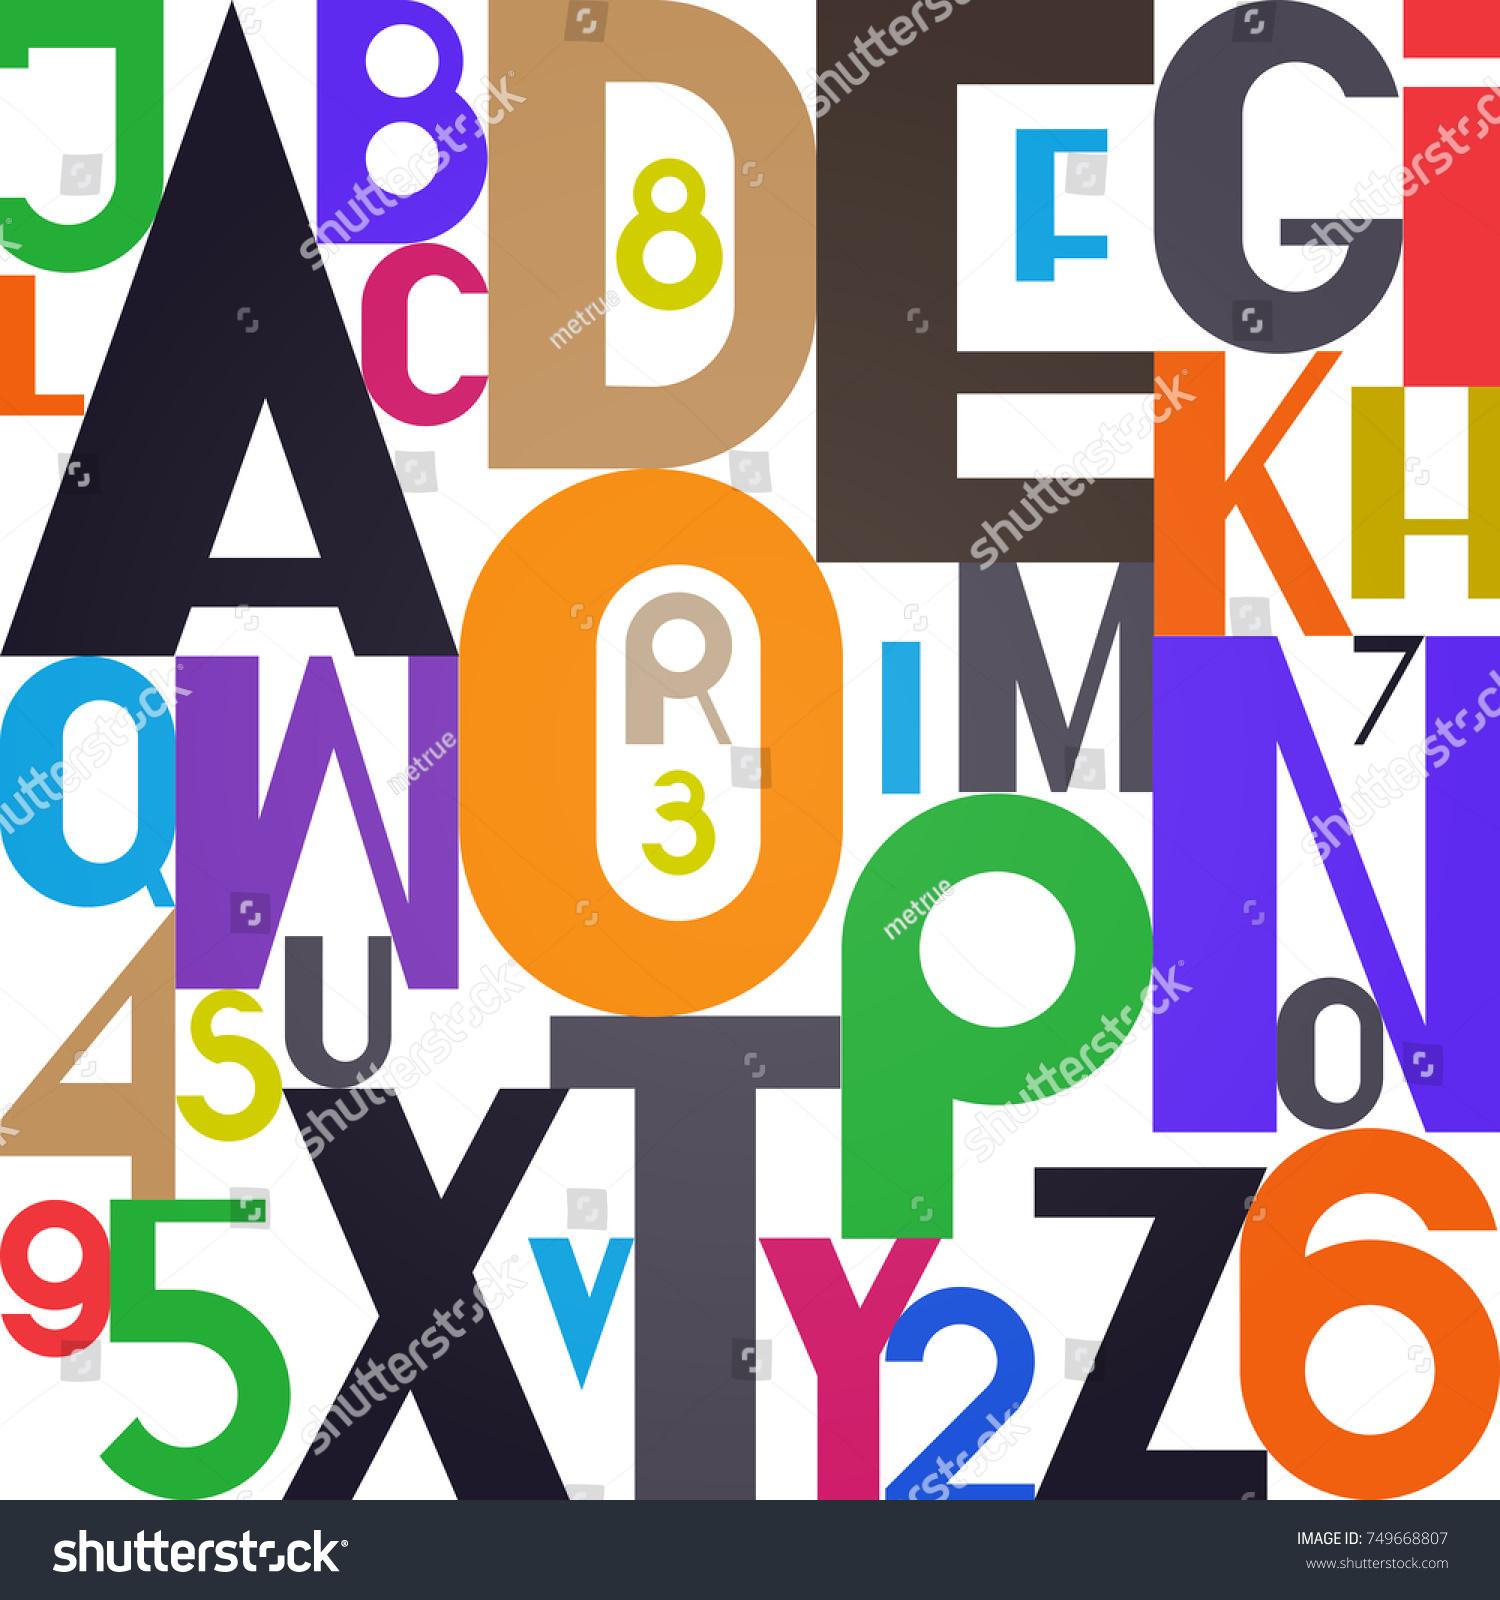 Watch - Bold stylish alphabets video